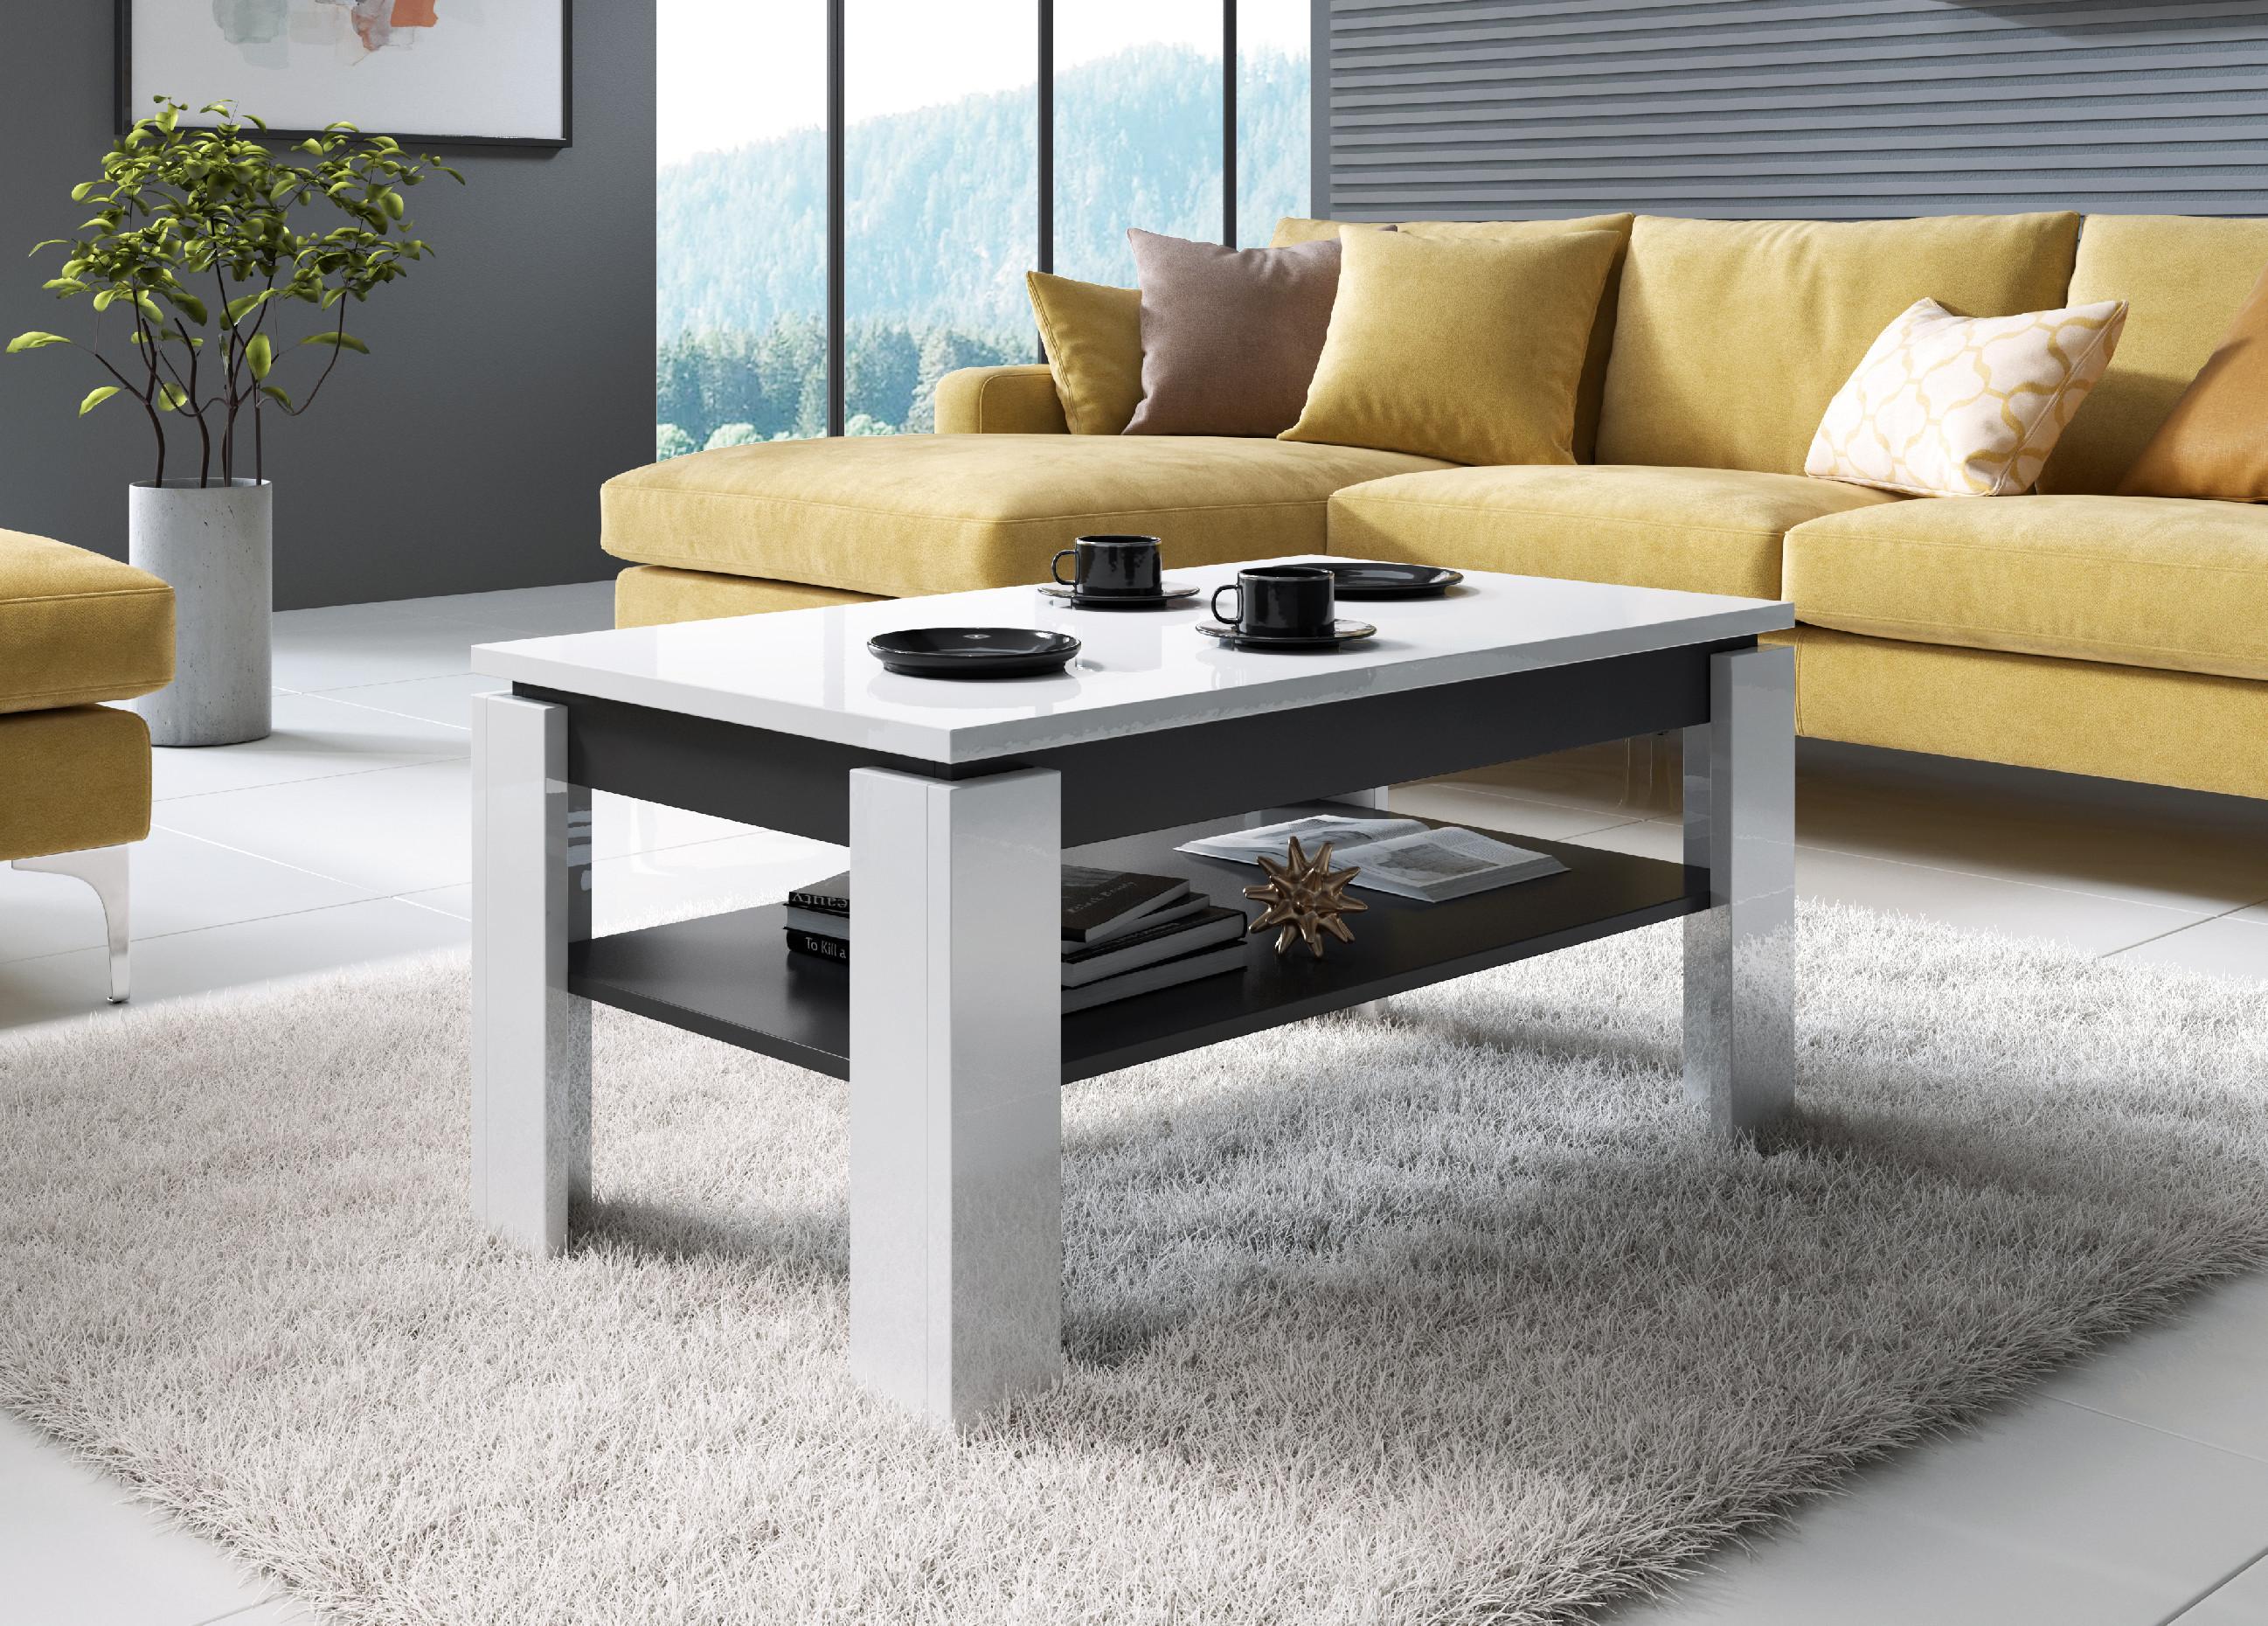 Cama Meble Konferenční stolička TORO Farba: bílý/grafit